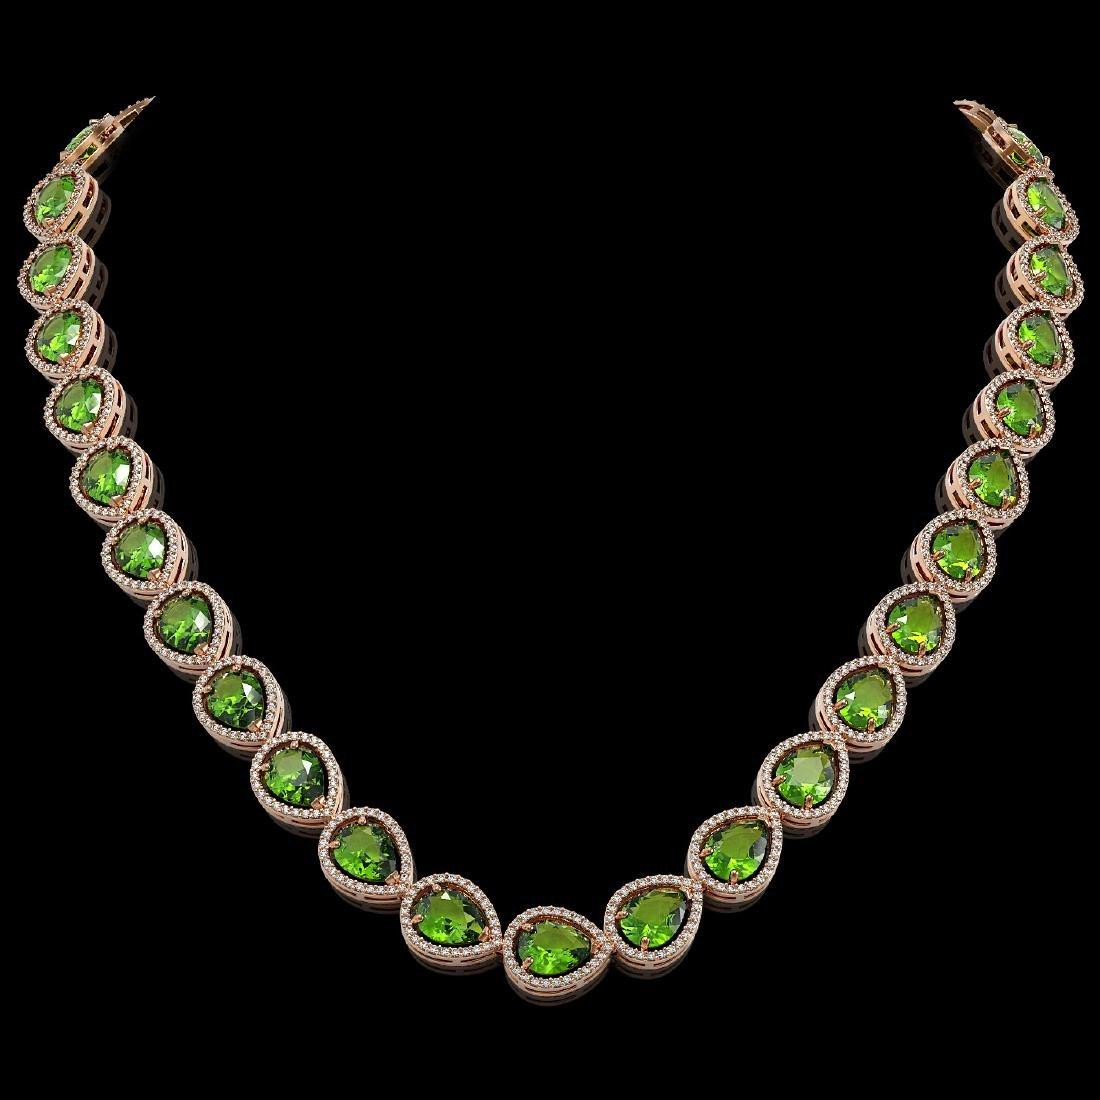 33.6 CTW Peridot & Diamond Halo Necklace 10K Rose Gold